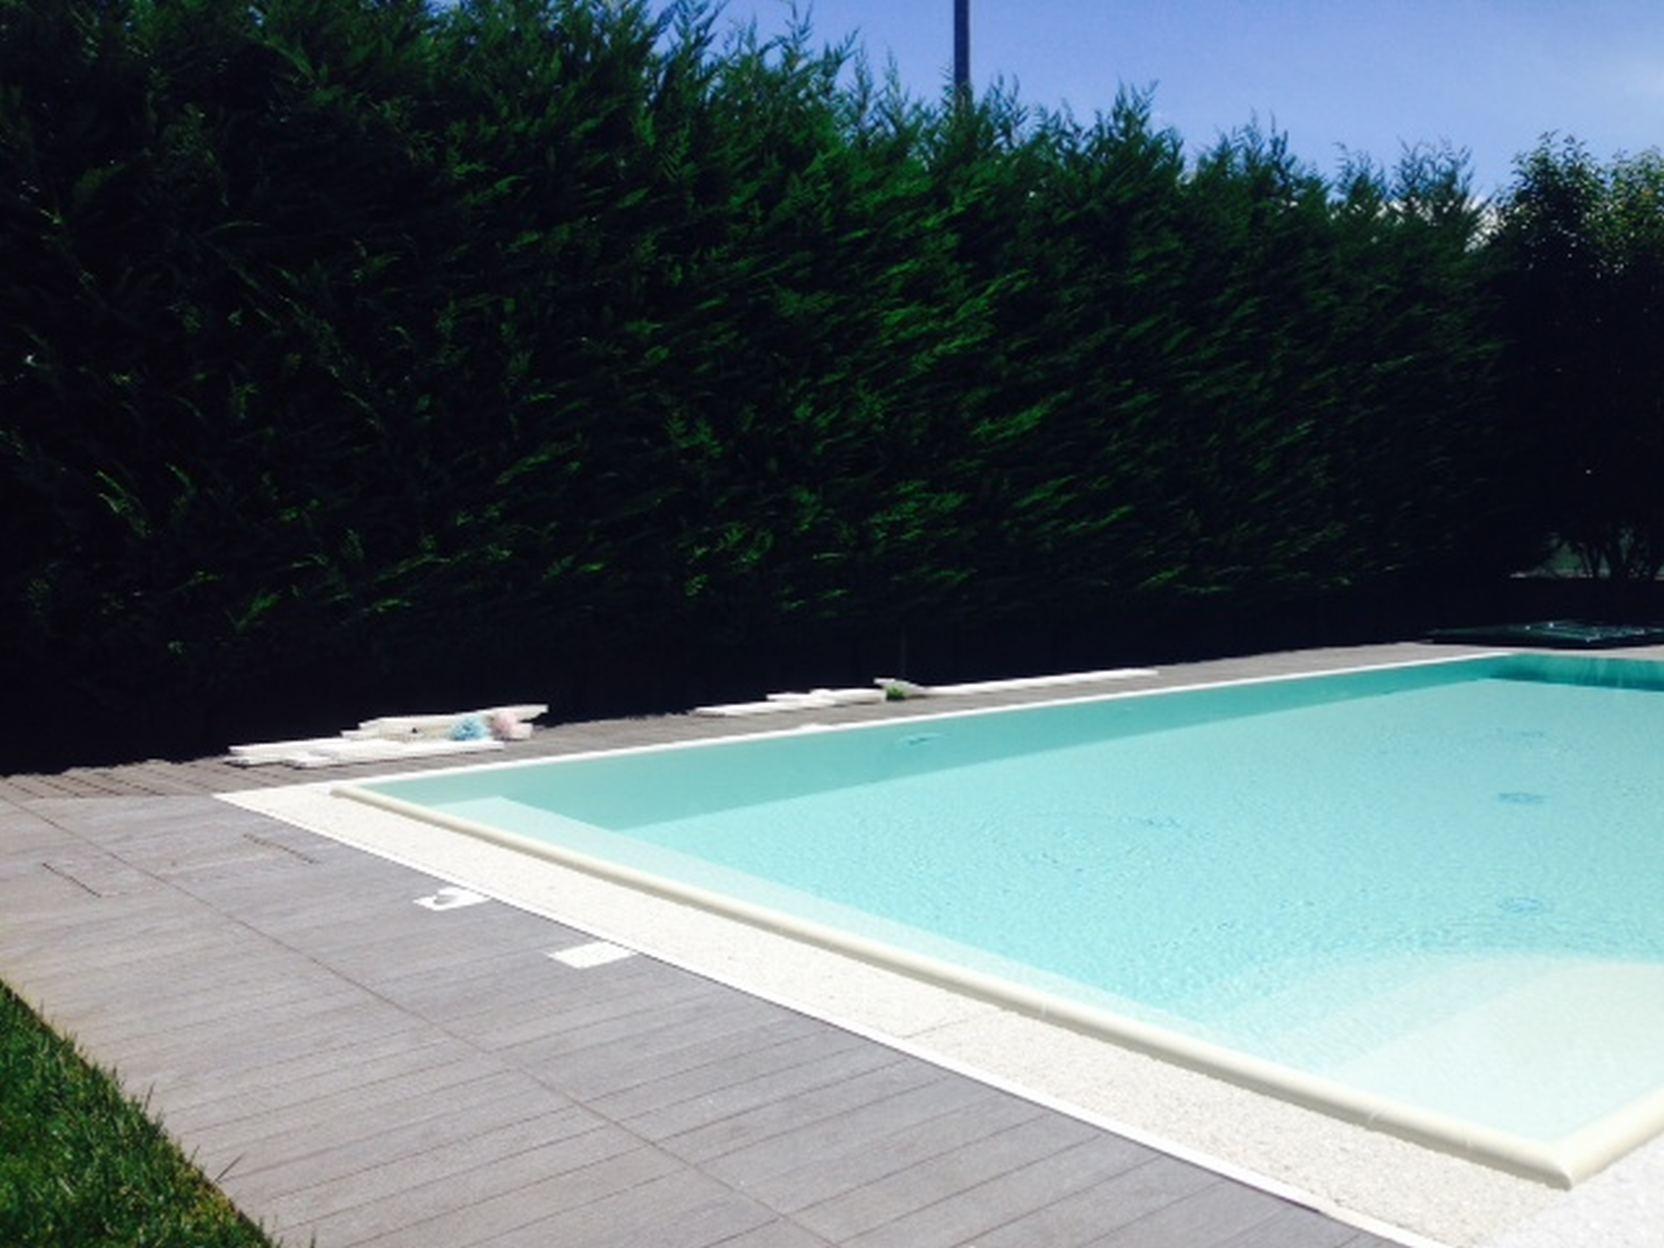 Levata (4) - Casareggio Piscine: piscine, piscine mantova, costruttori di piscine